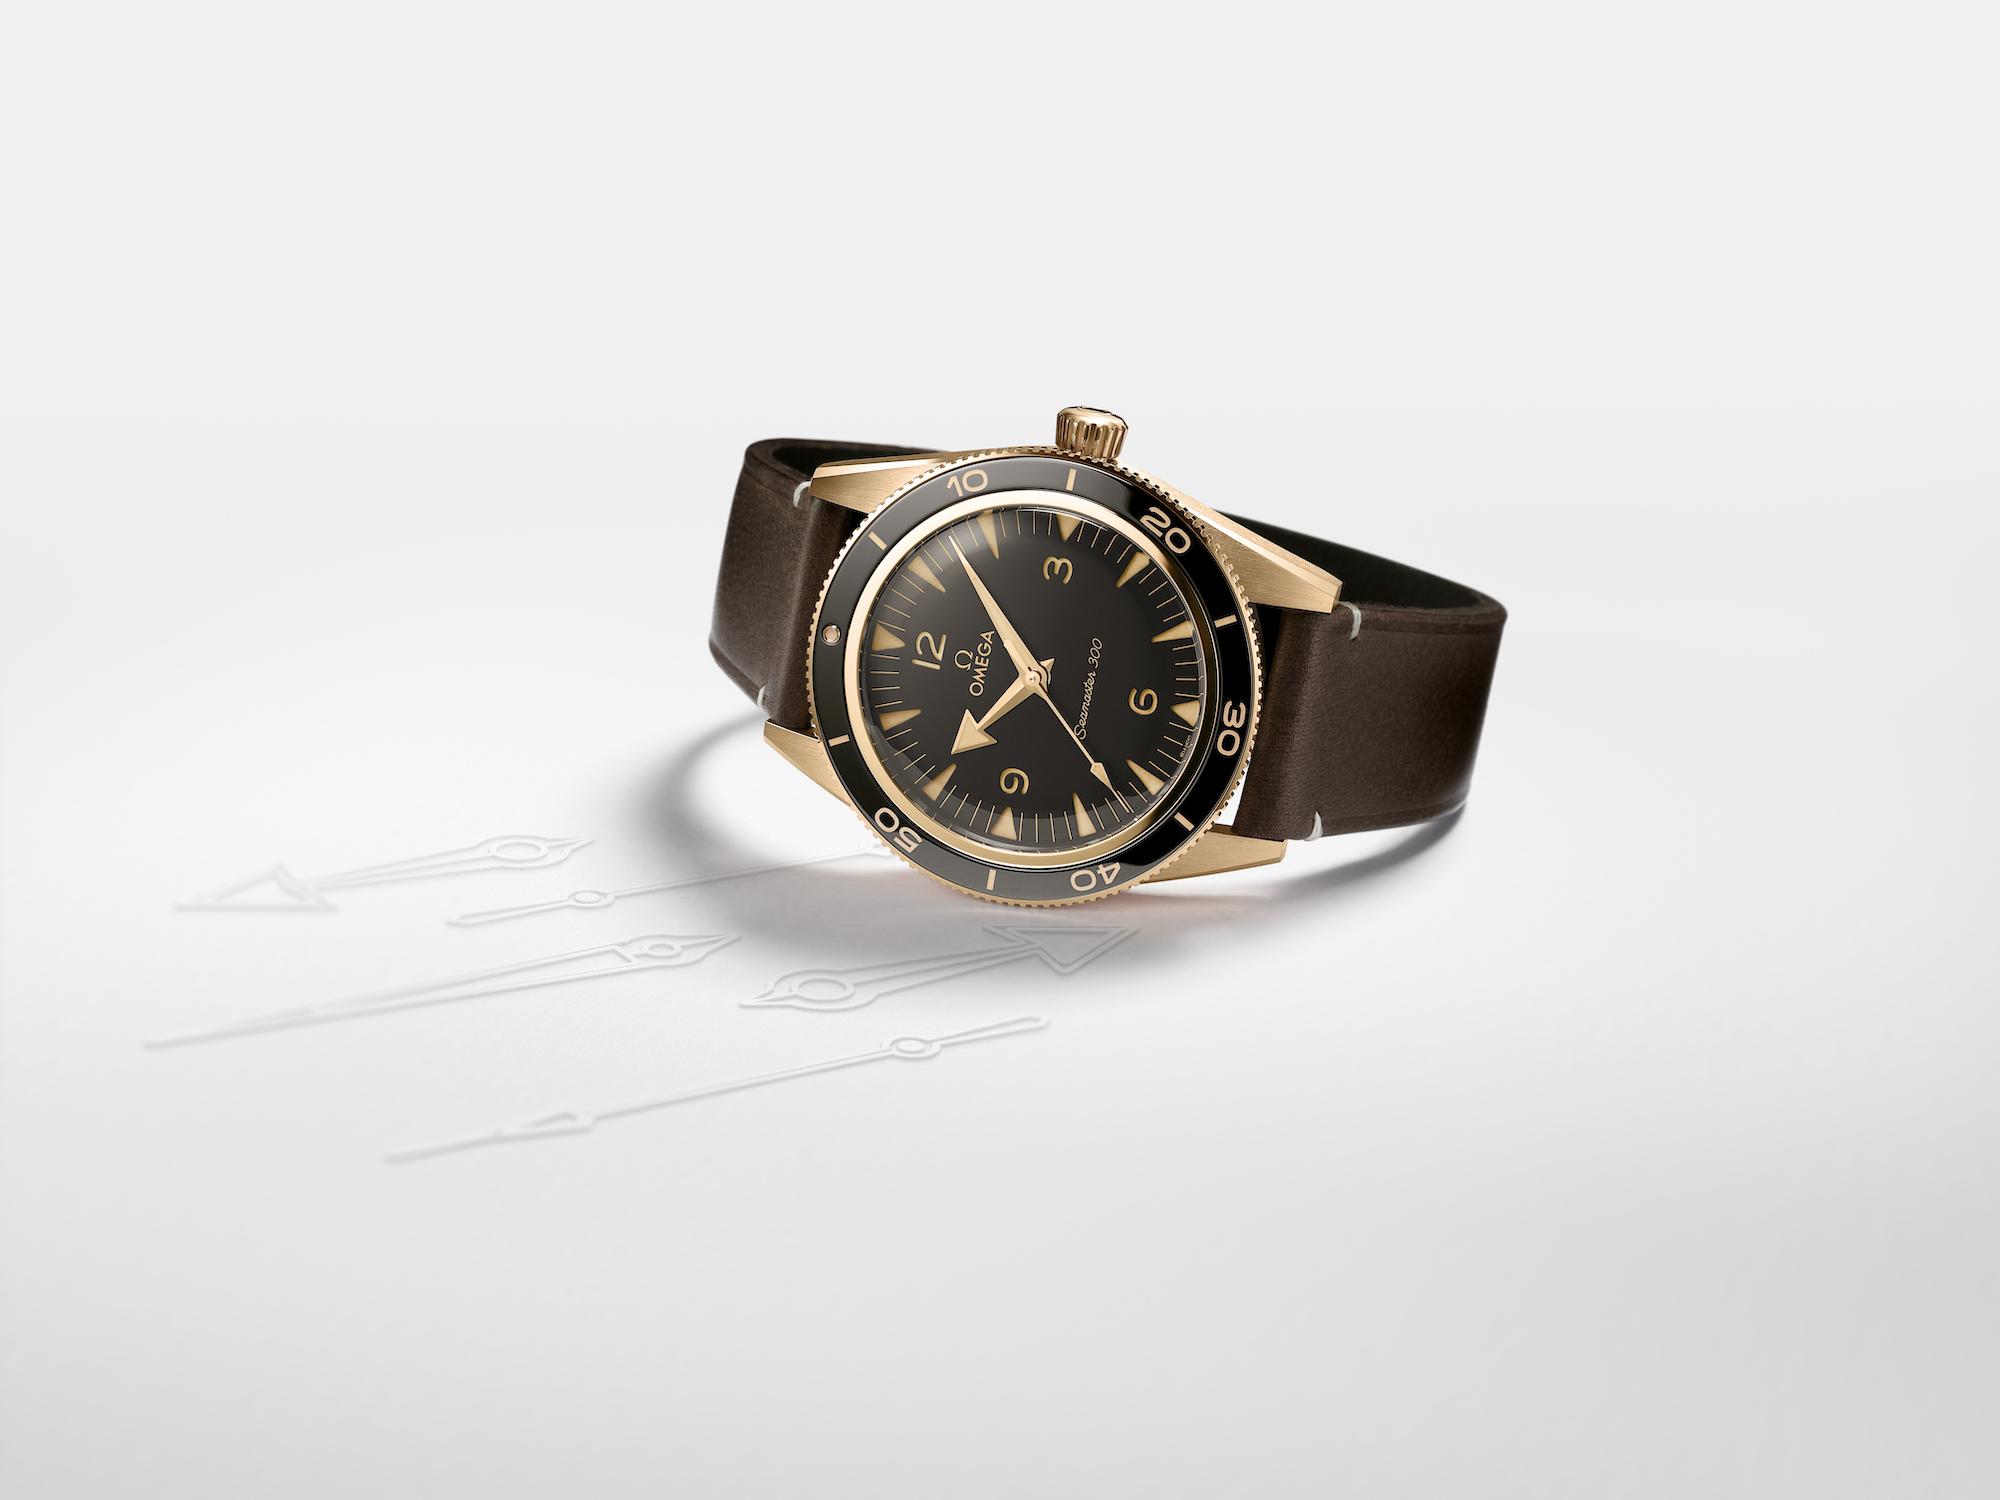 Omega Seamaster 300 234.92.41.21.10.001 2